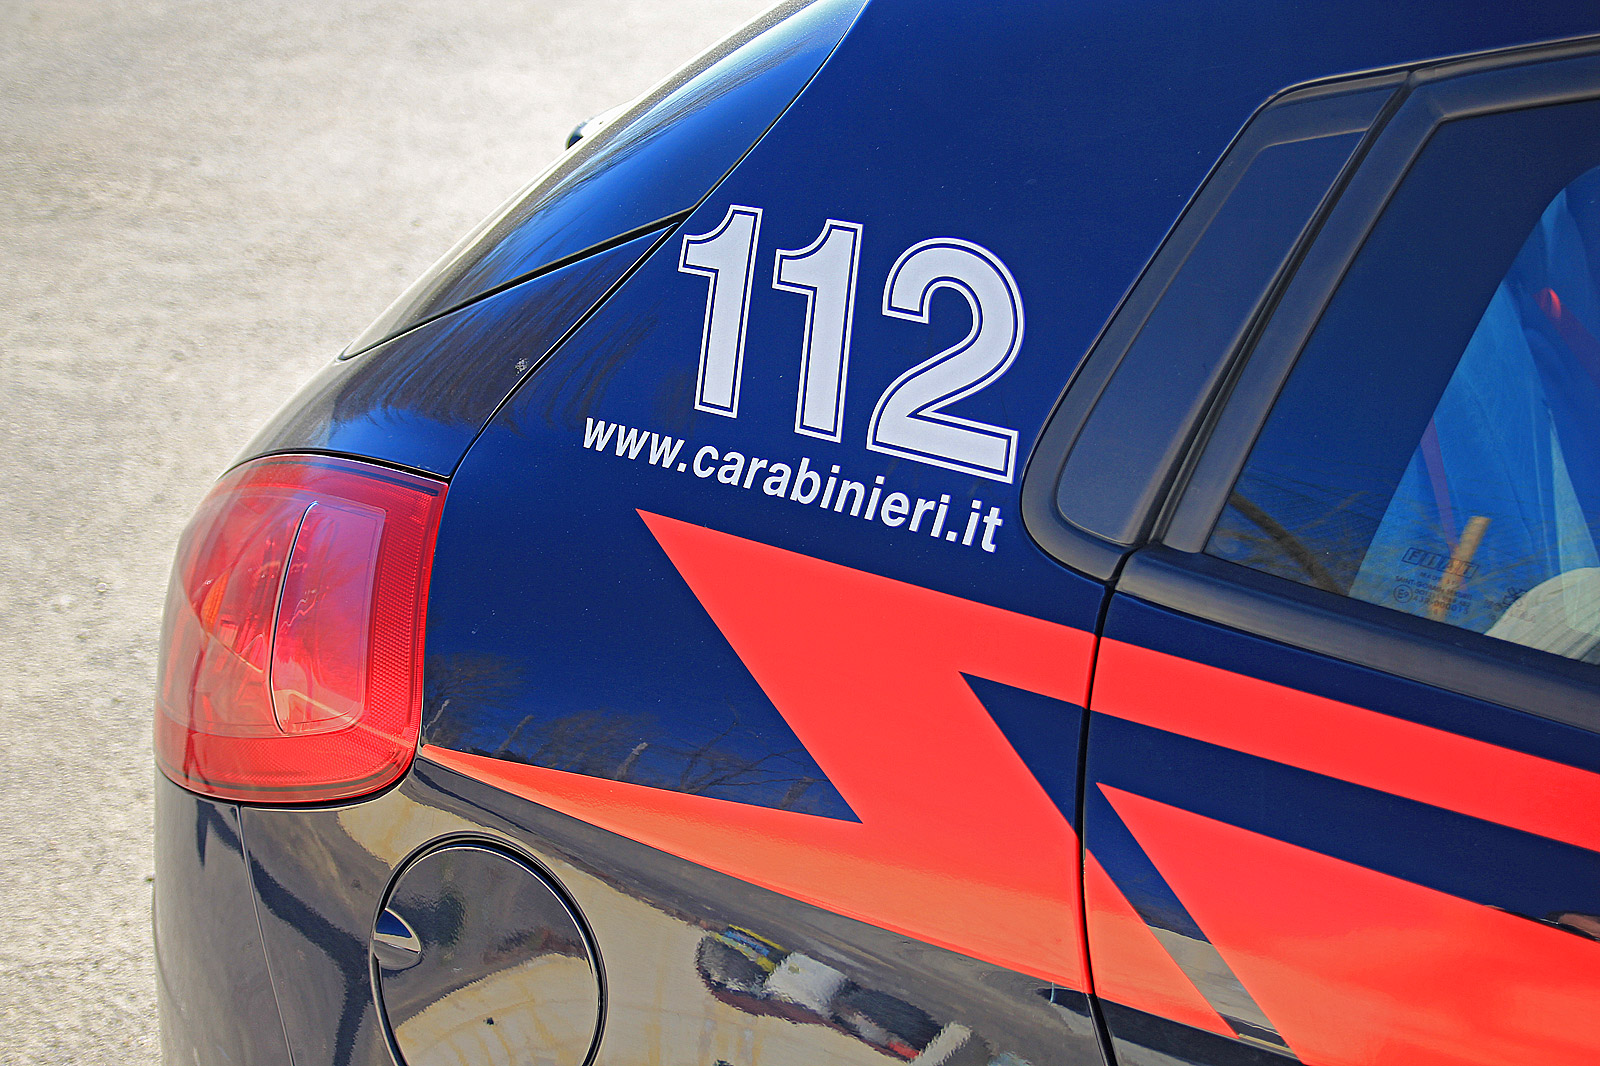 Droga: due arresti dei Carabinieri a Cortona